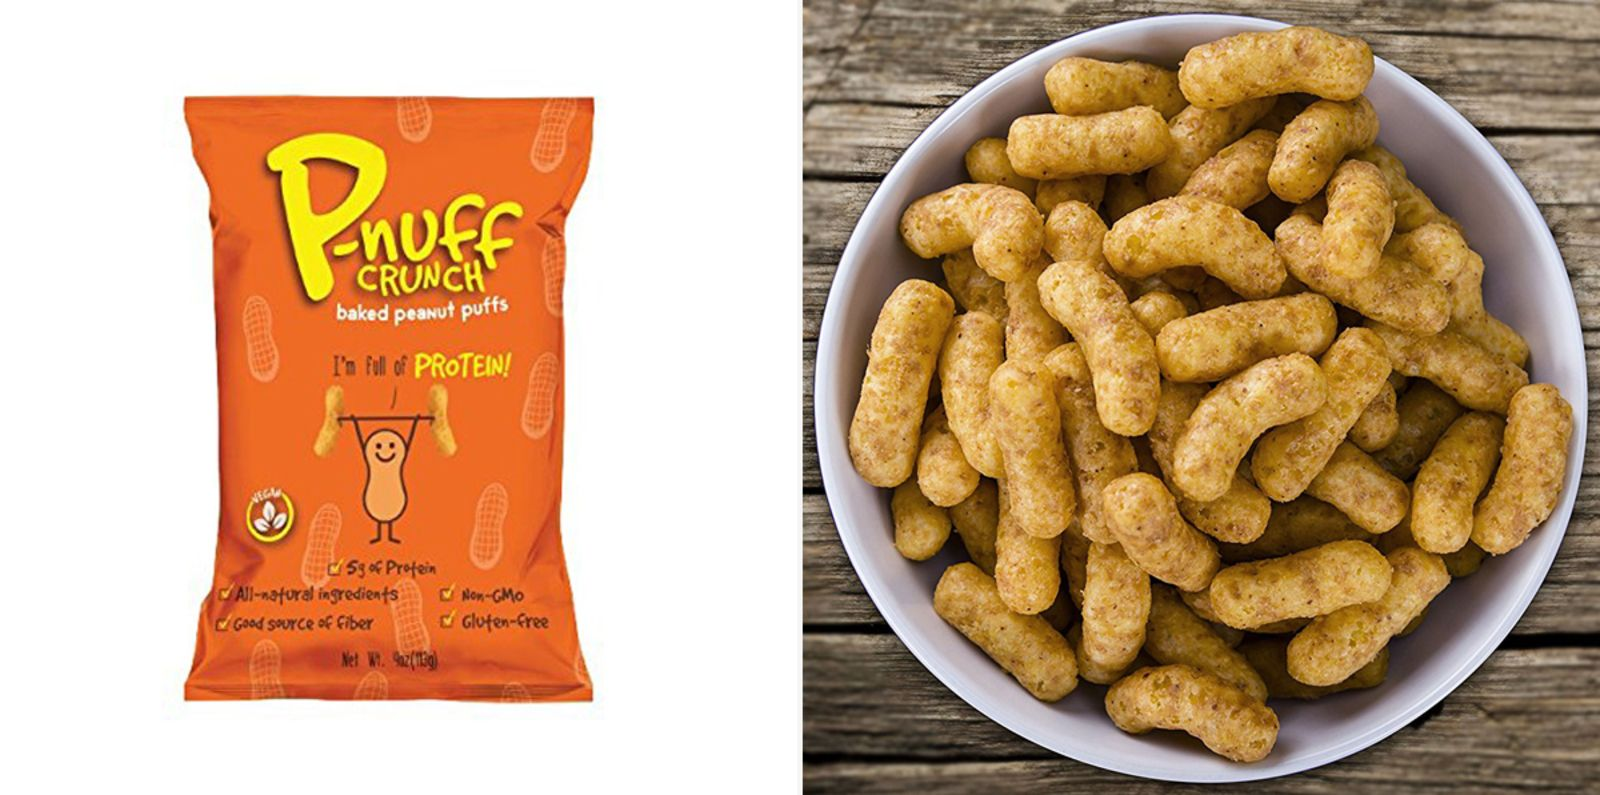 Pnuff Crunch Puff Snacks Whole food recipes, Snacks